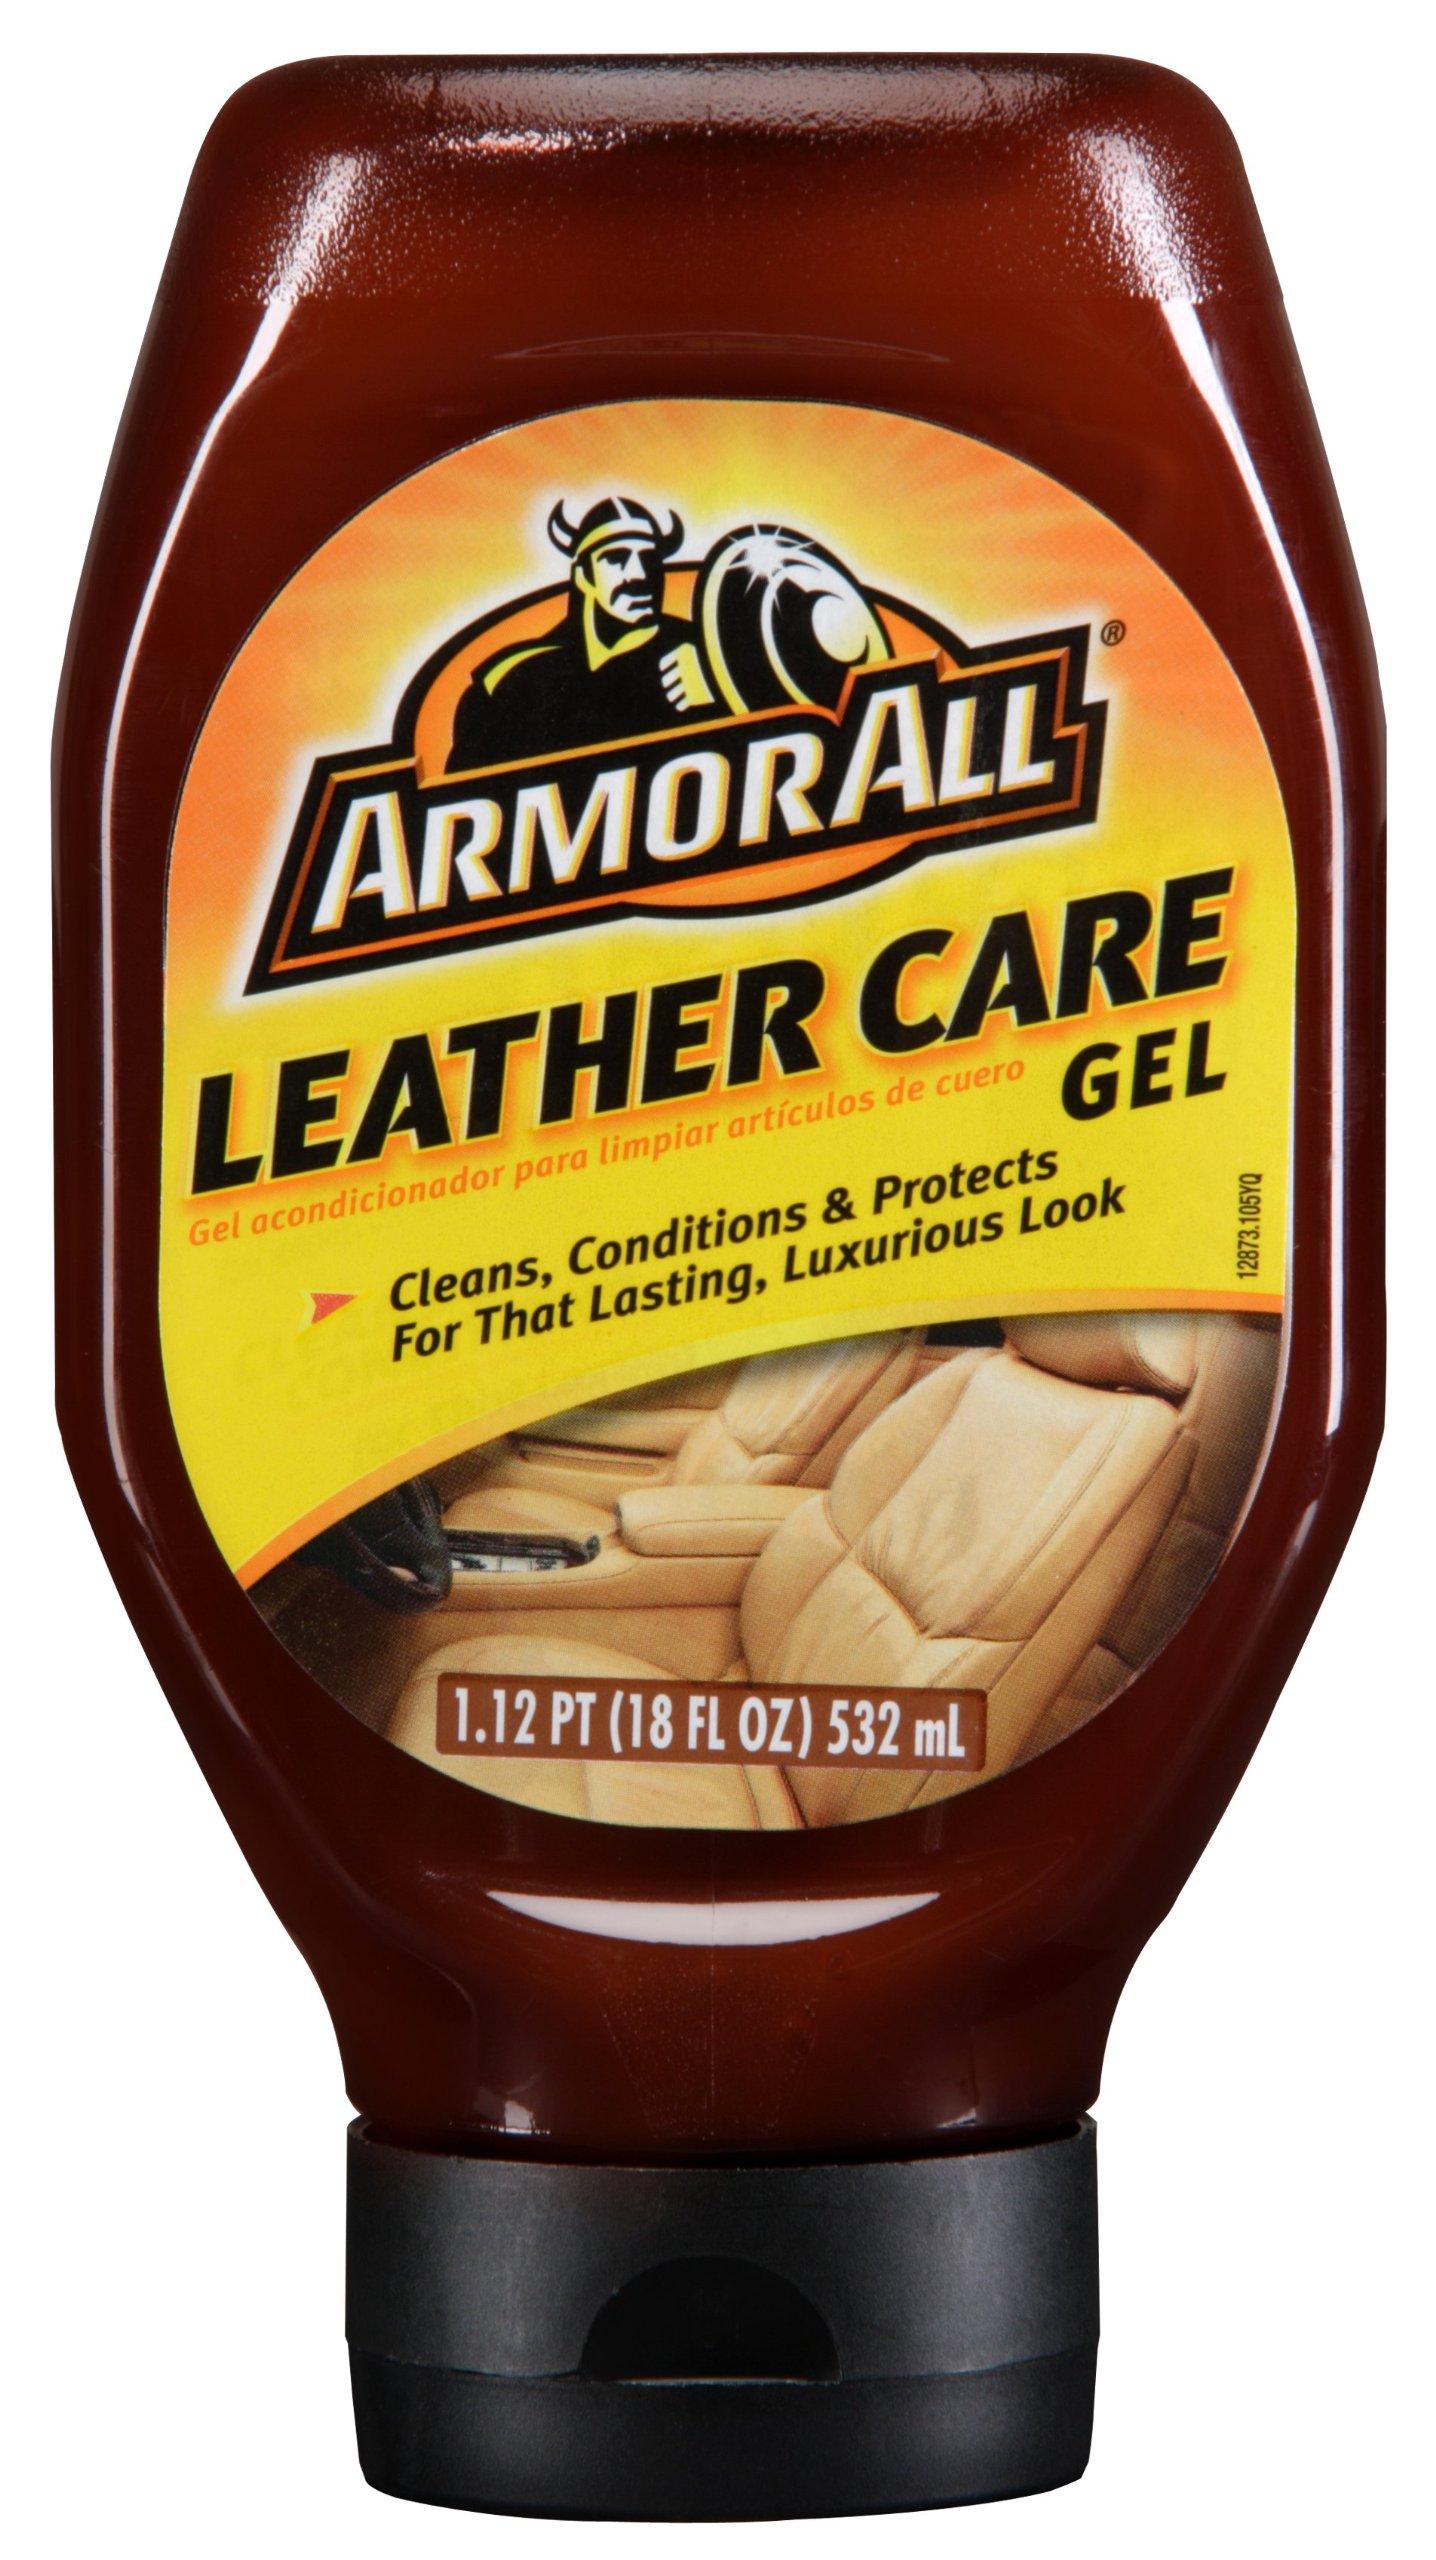 Armor All Leather Care Gel Fluid - 18 oz. Bottle, (Pack of 6)